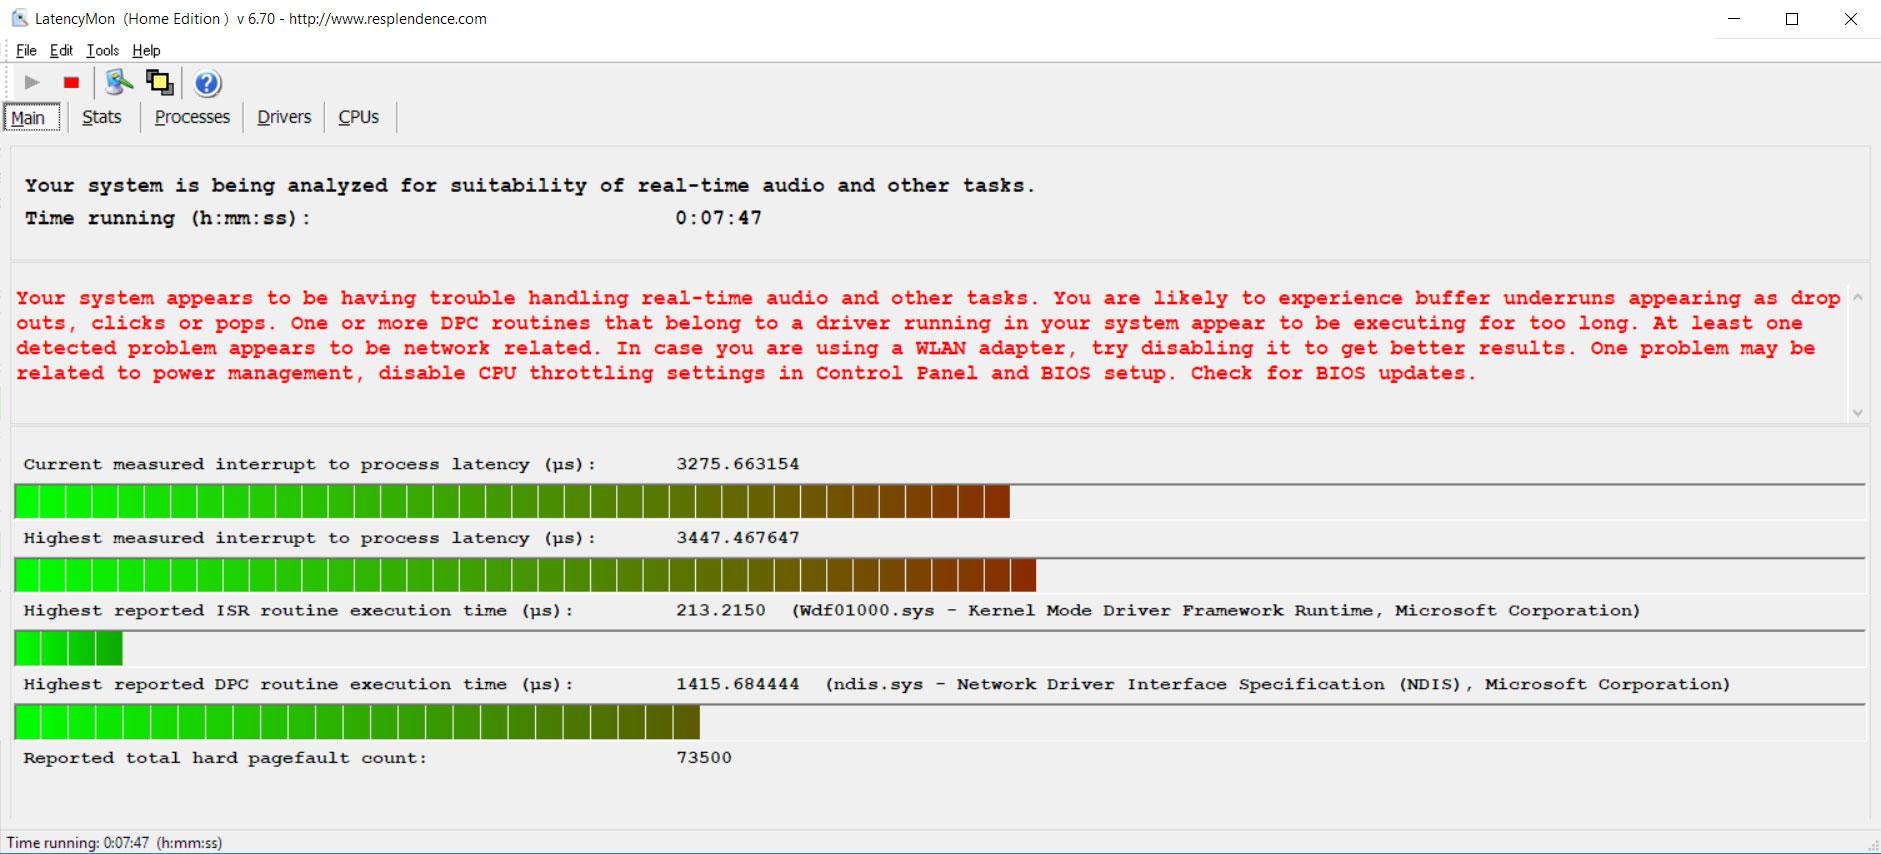 Huawei MateBook D 15 review (i5-8250U, UHD 620)